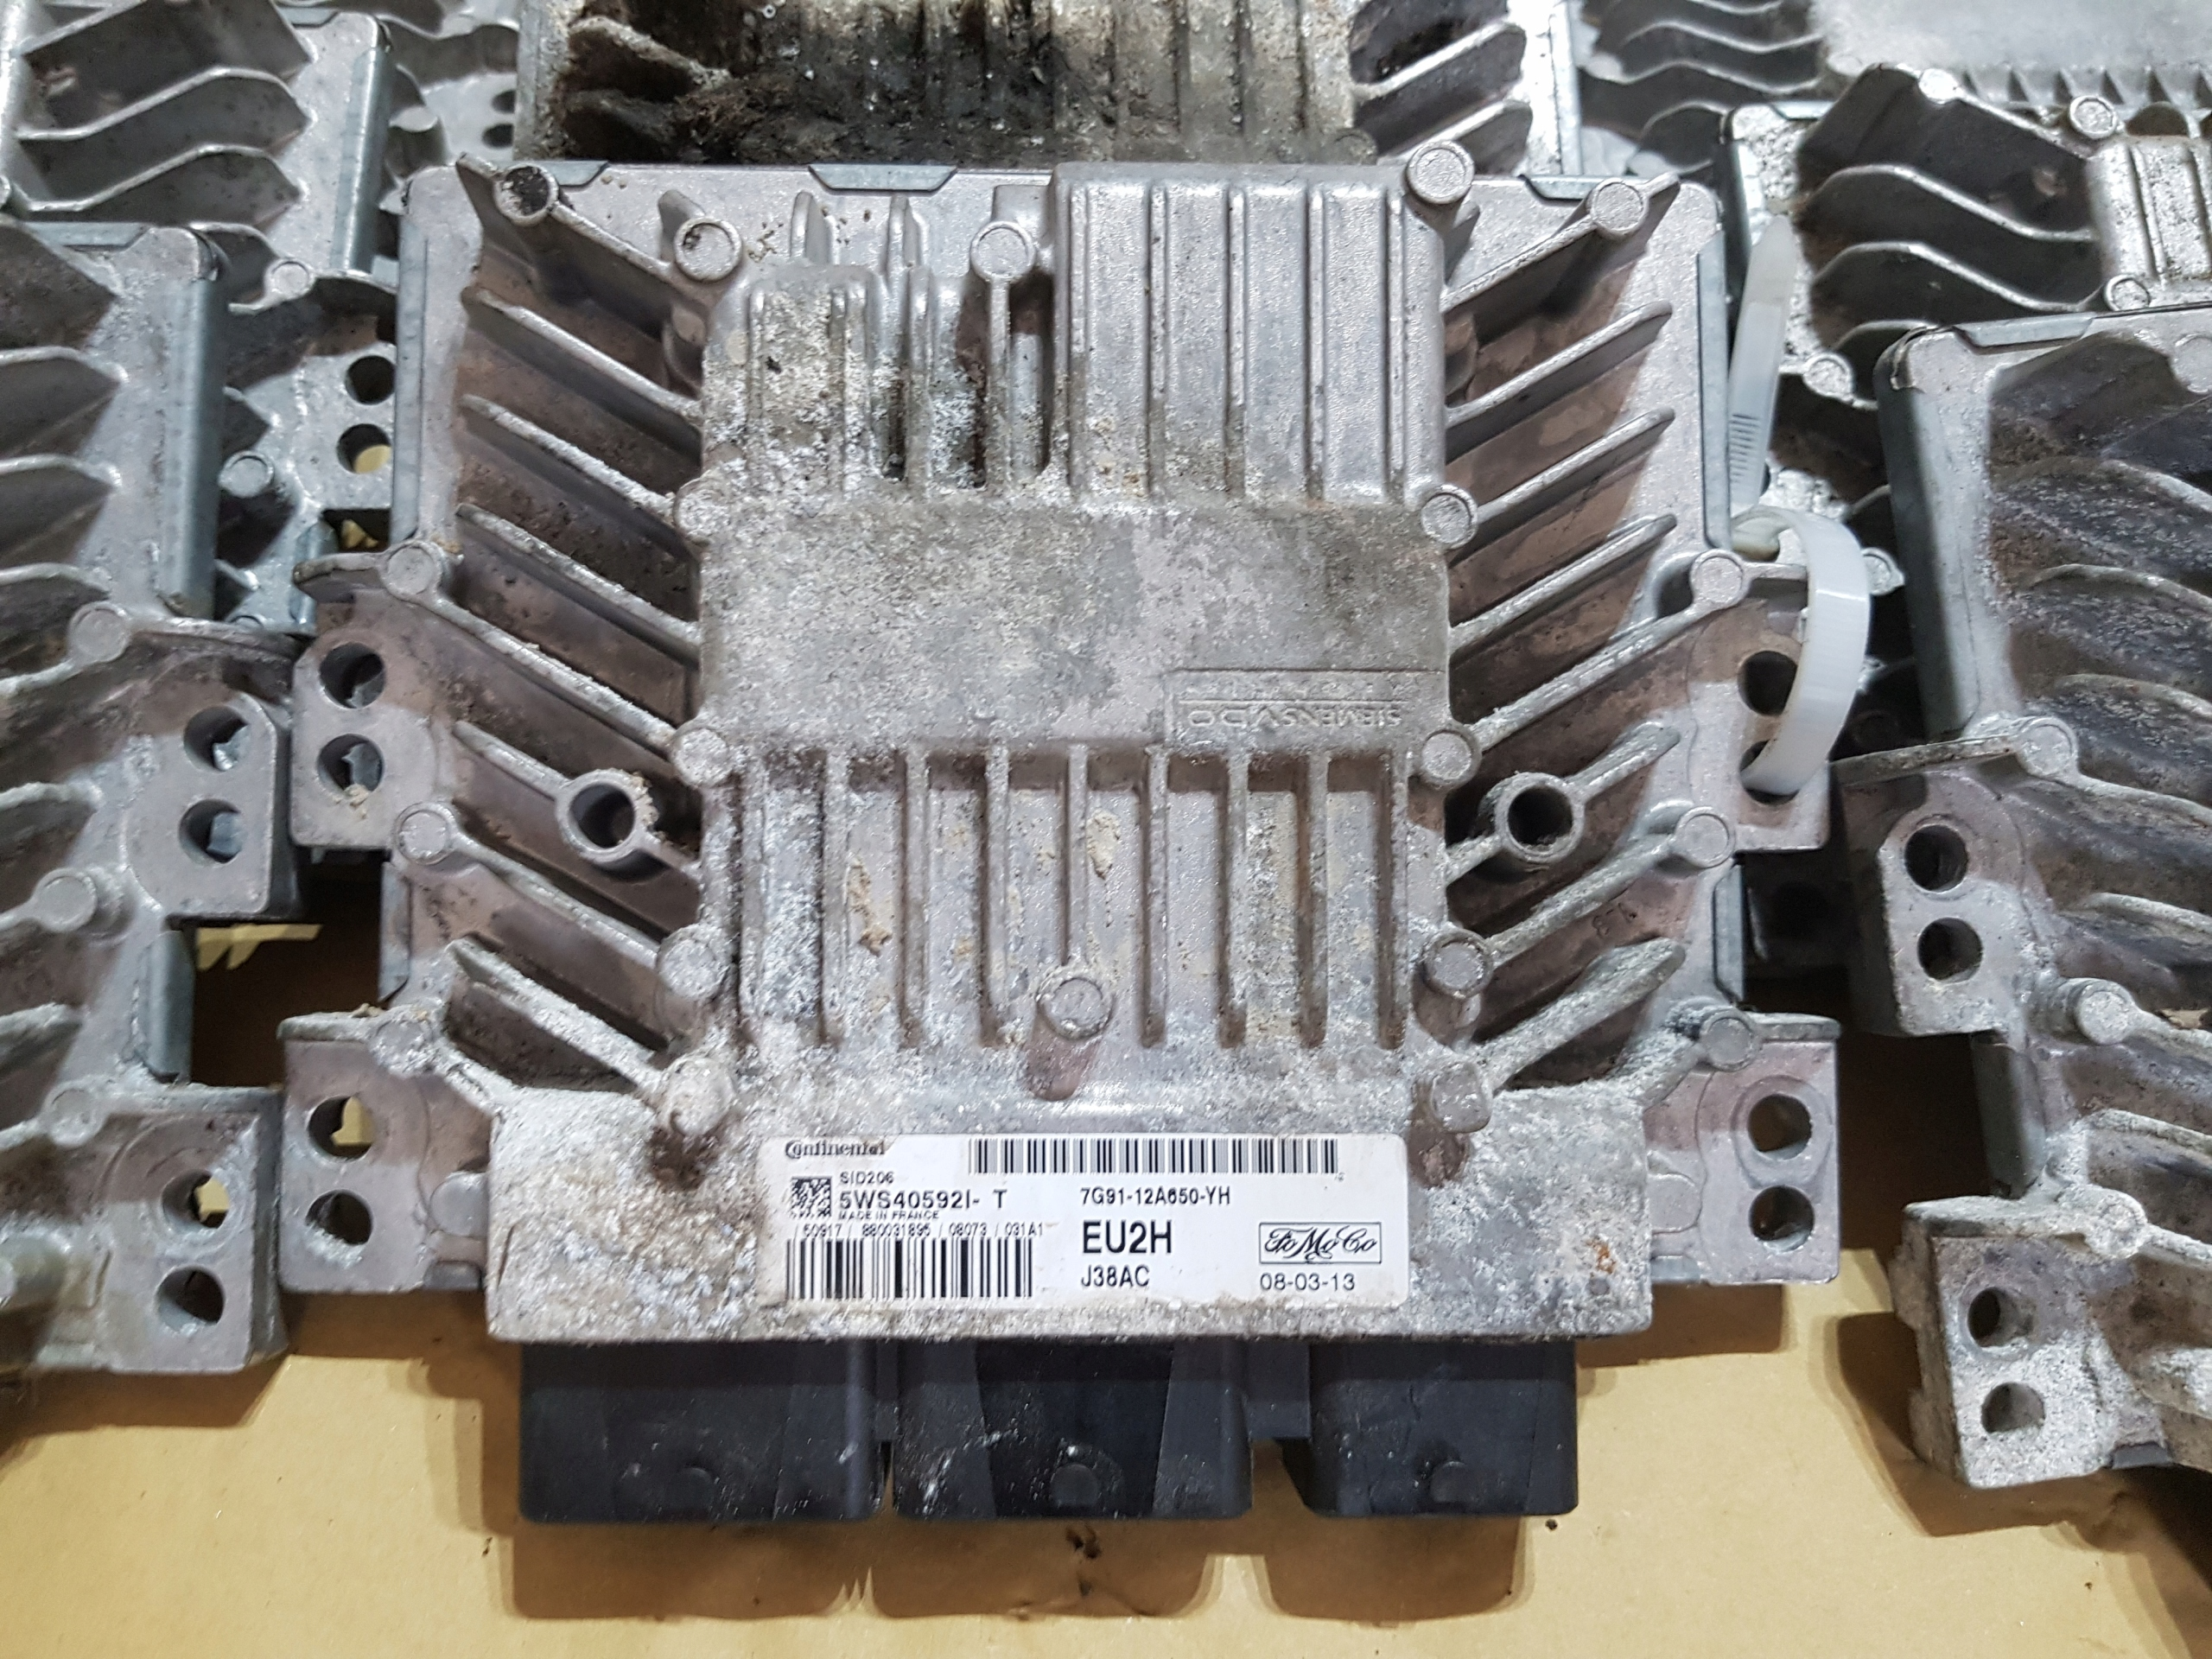 компьютер двигателя mondeo mk4 18tdci 7g91-12a650-yh